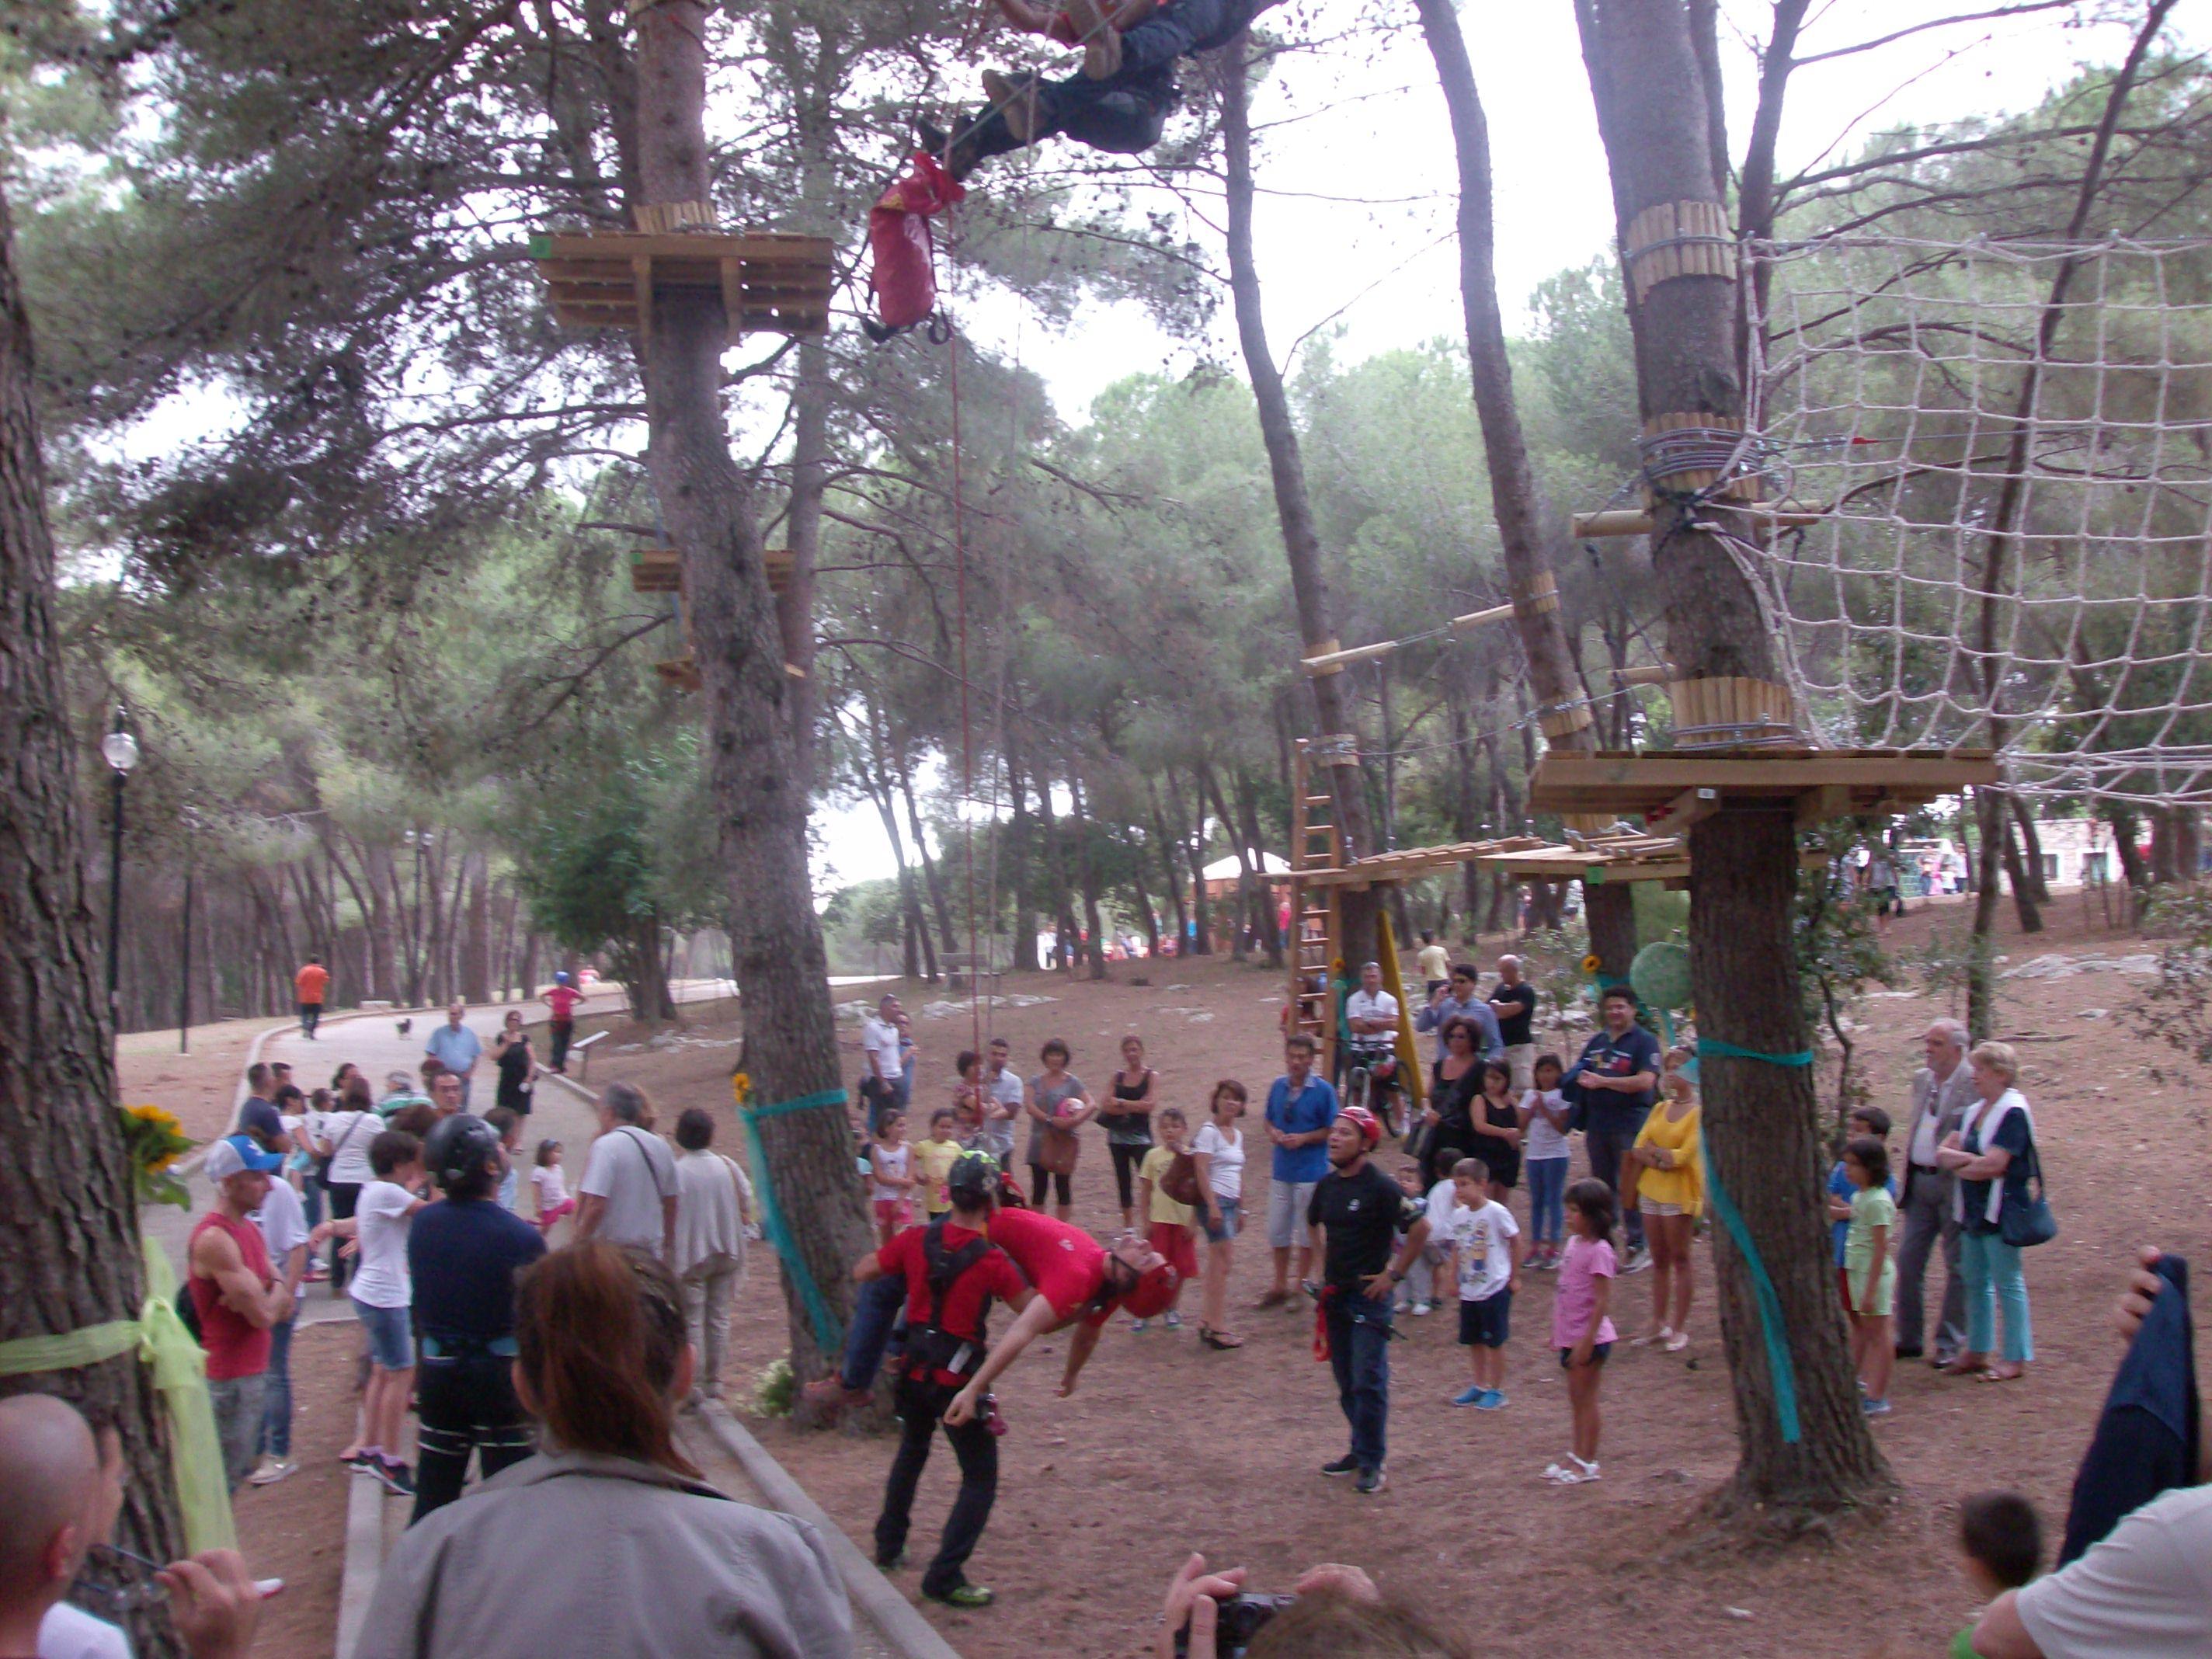 Parco Avventura Baddimanna